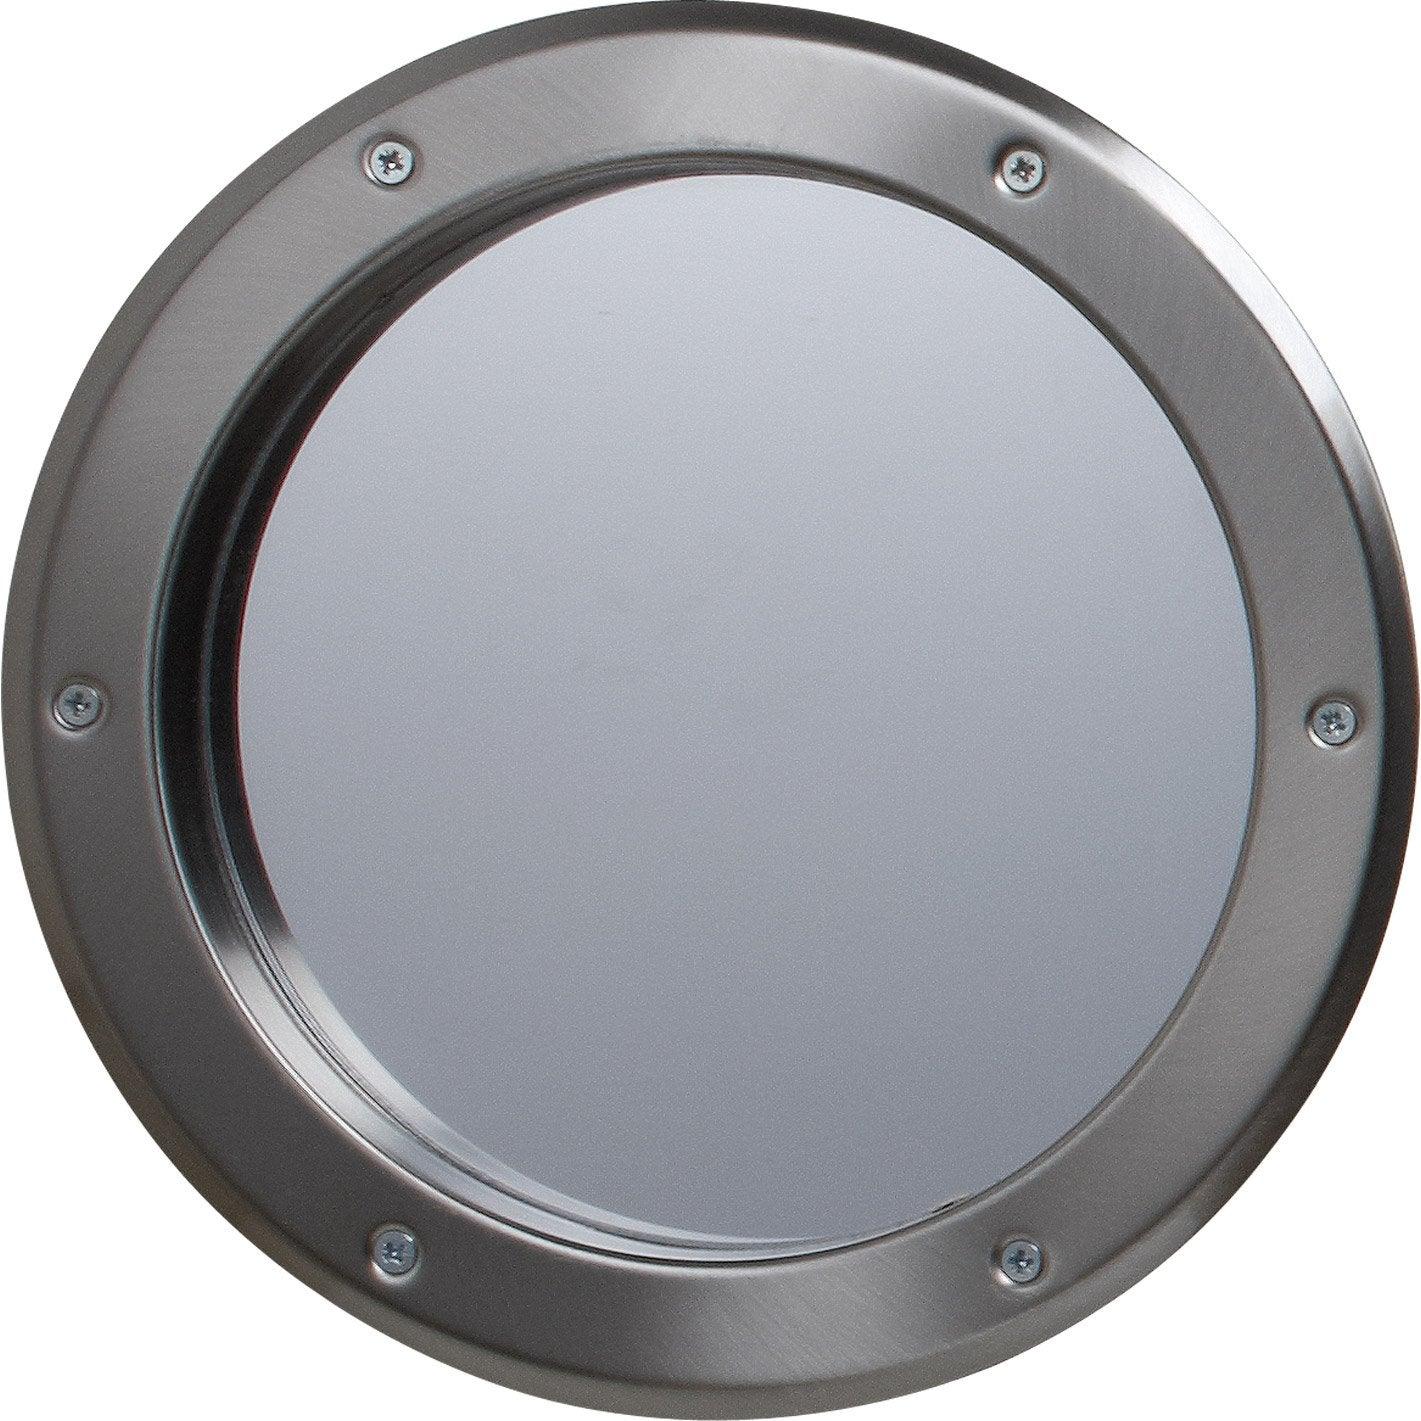 hublot de porte en m tal rond gris m tal 26 cm leroy merlin. Black Bedroom Furniture Sets. Home Design Ideas